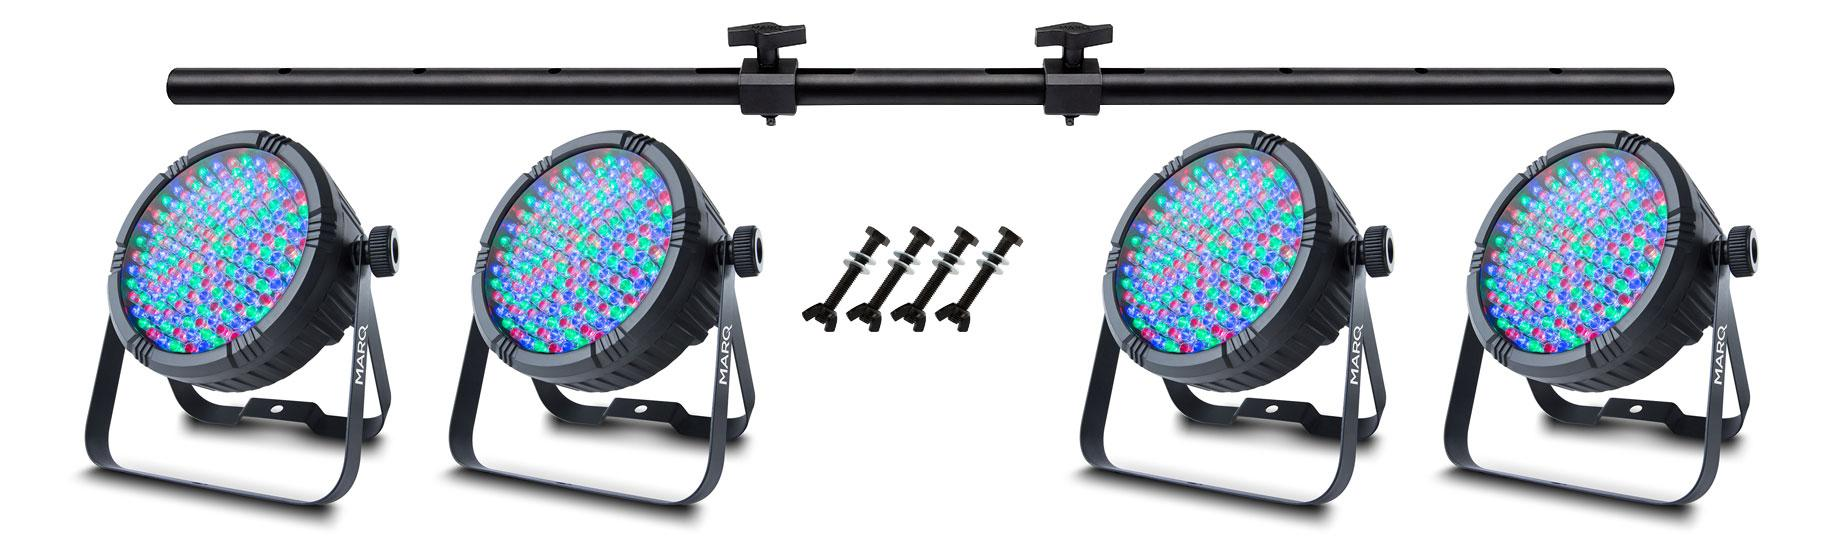 Marq Lighting Colormax PAR64 LED Spot PA Light Rig Set